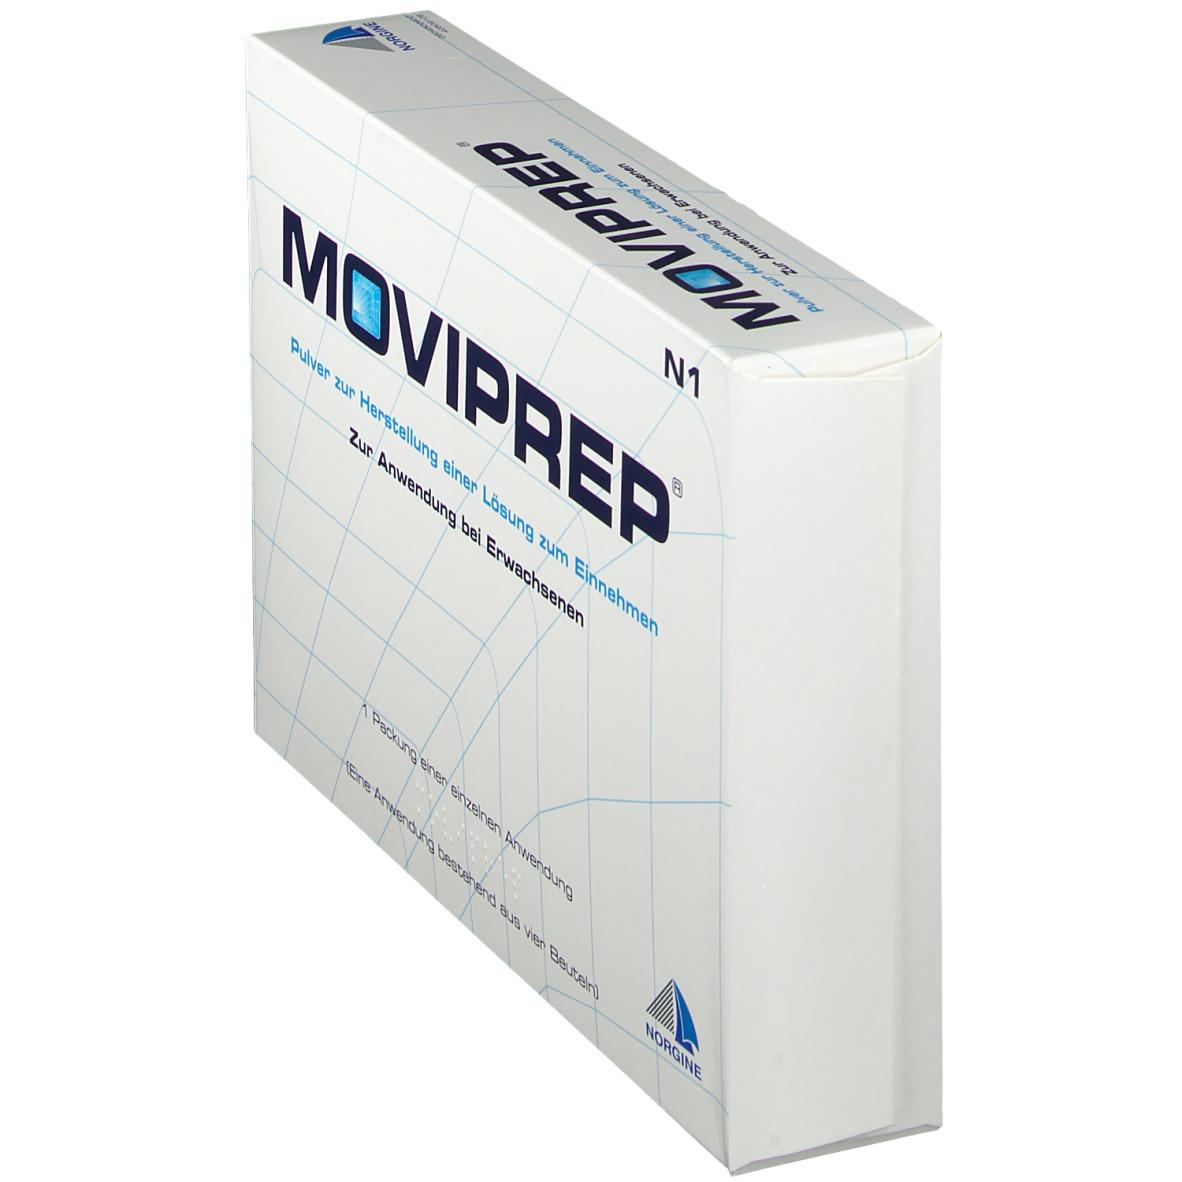 Moviprep wirkungsdauer  MOVIPREP Orange  2019-04-30